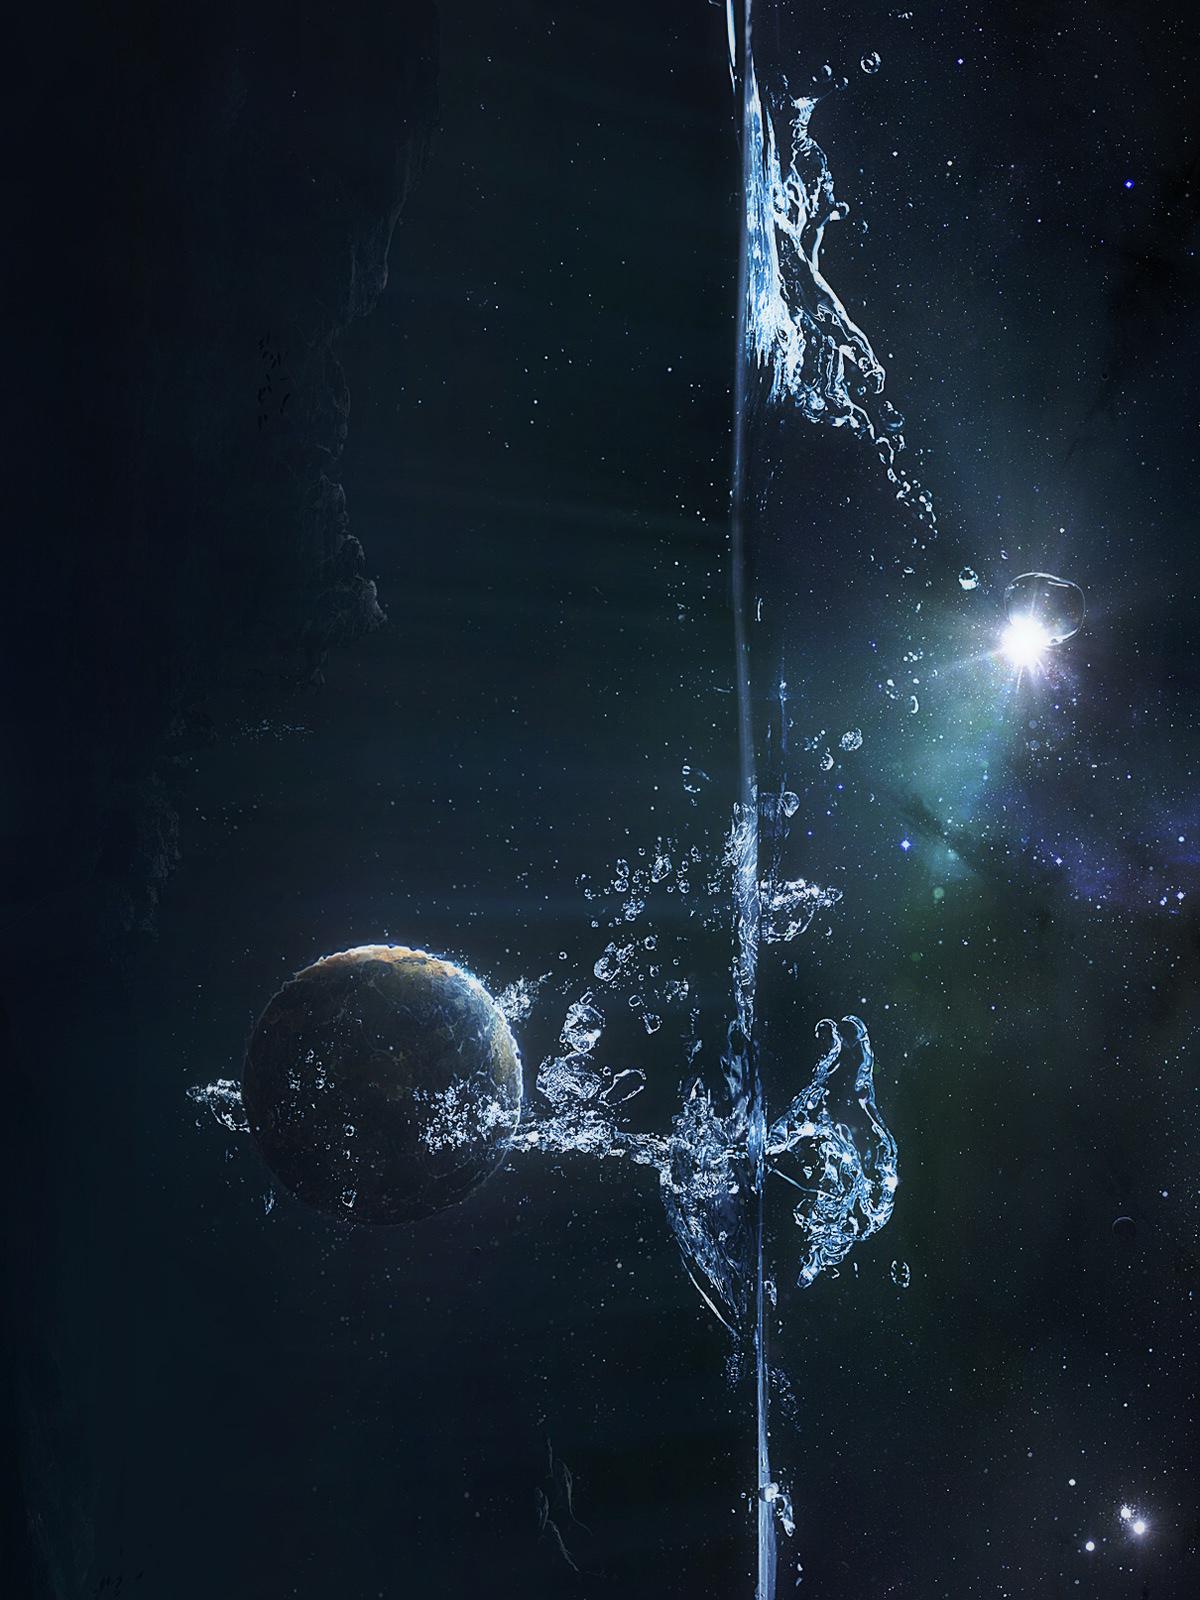 Planet Game Wallaper Art Hd Image Zeromin0